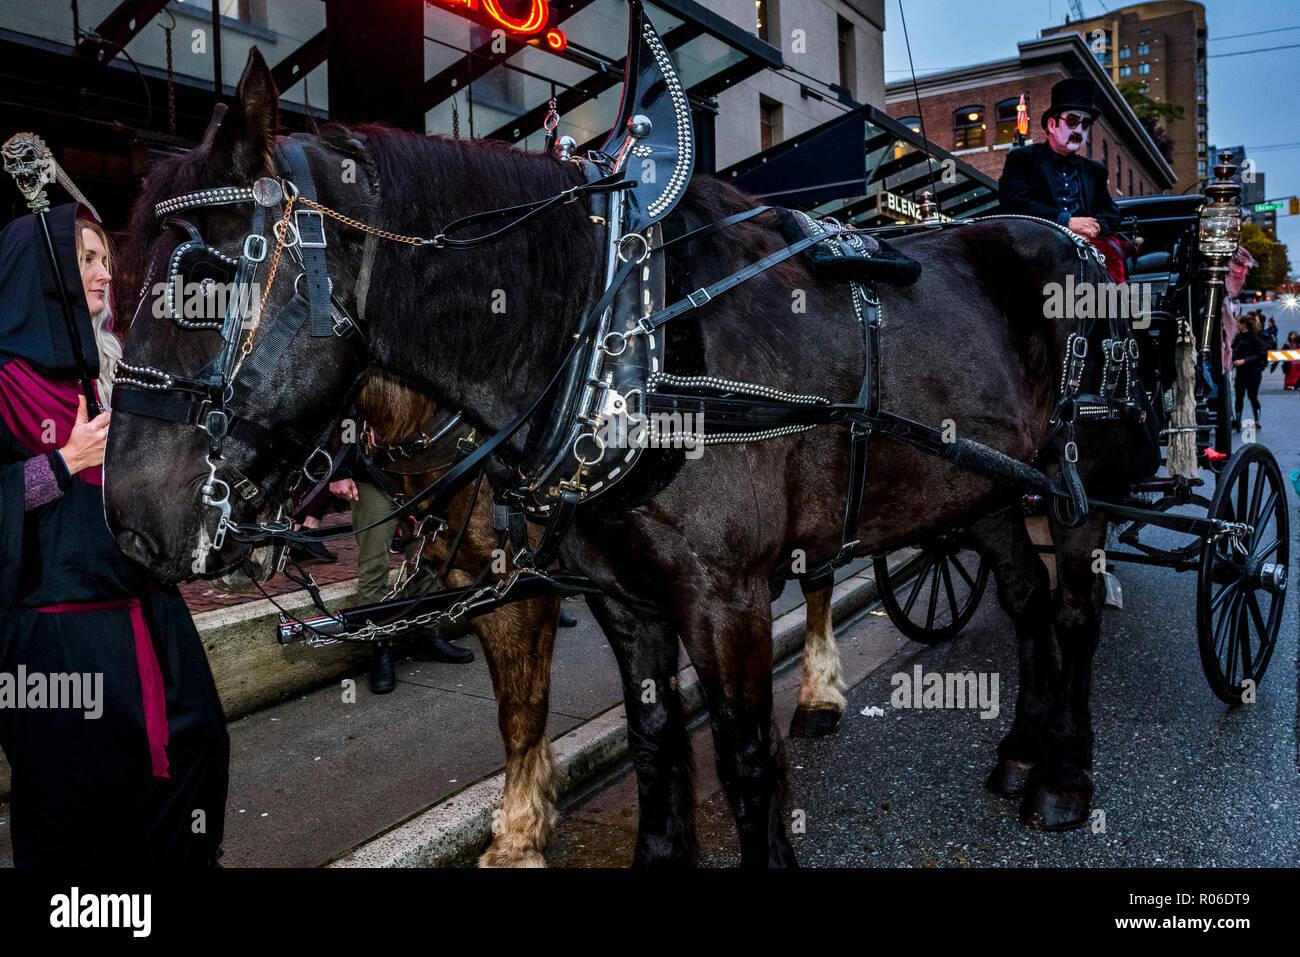 Yaletown Halloween 2020 Horse drawn hearse, Halloween, Yaletown, Vancouver, British